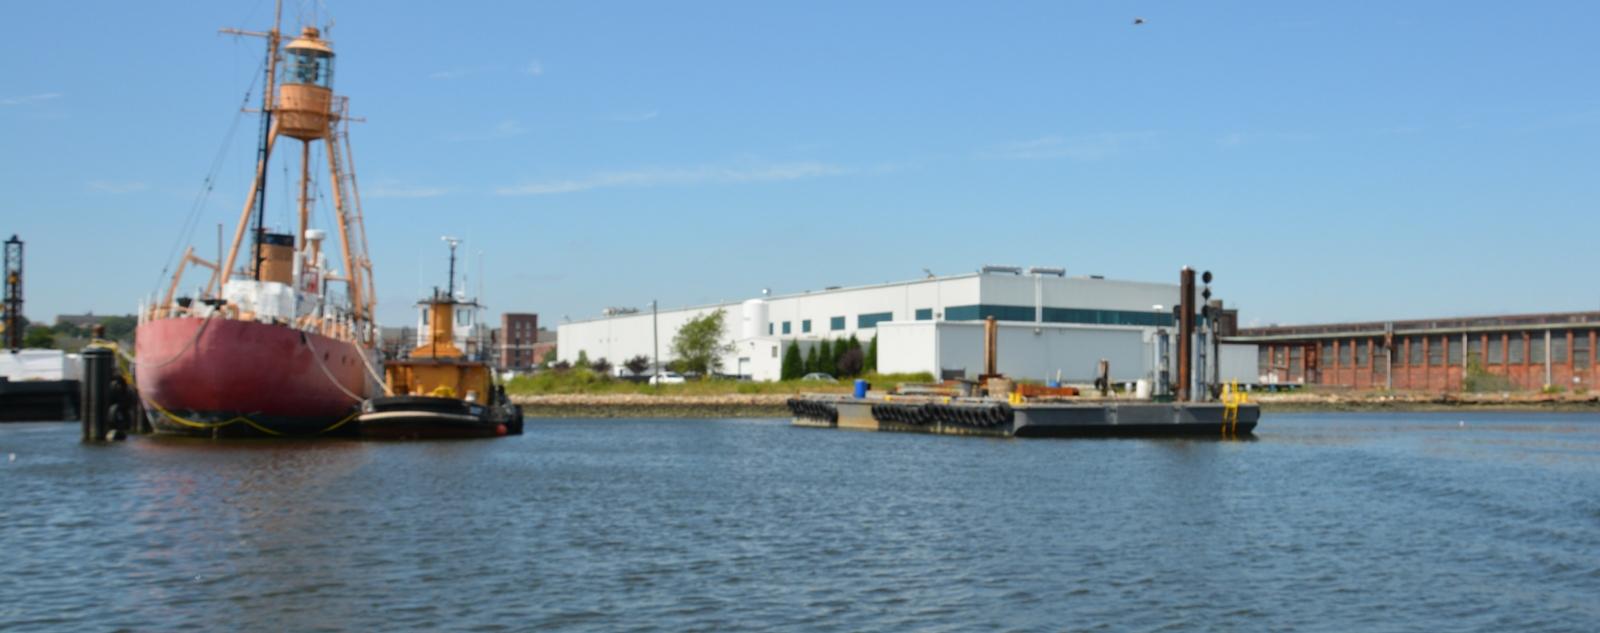 Seatrade Announces Acquisition of Scallop Processing Facility